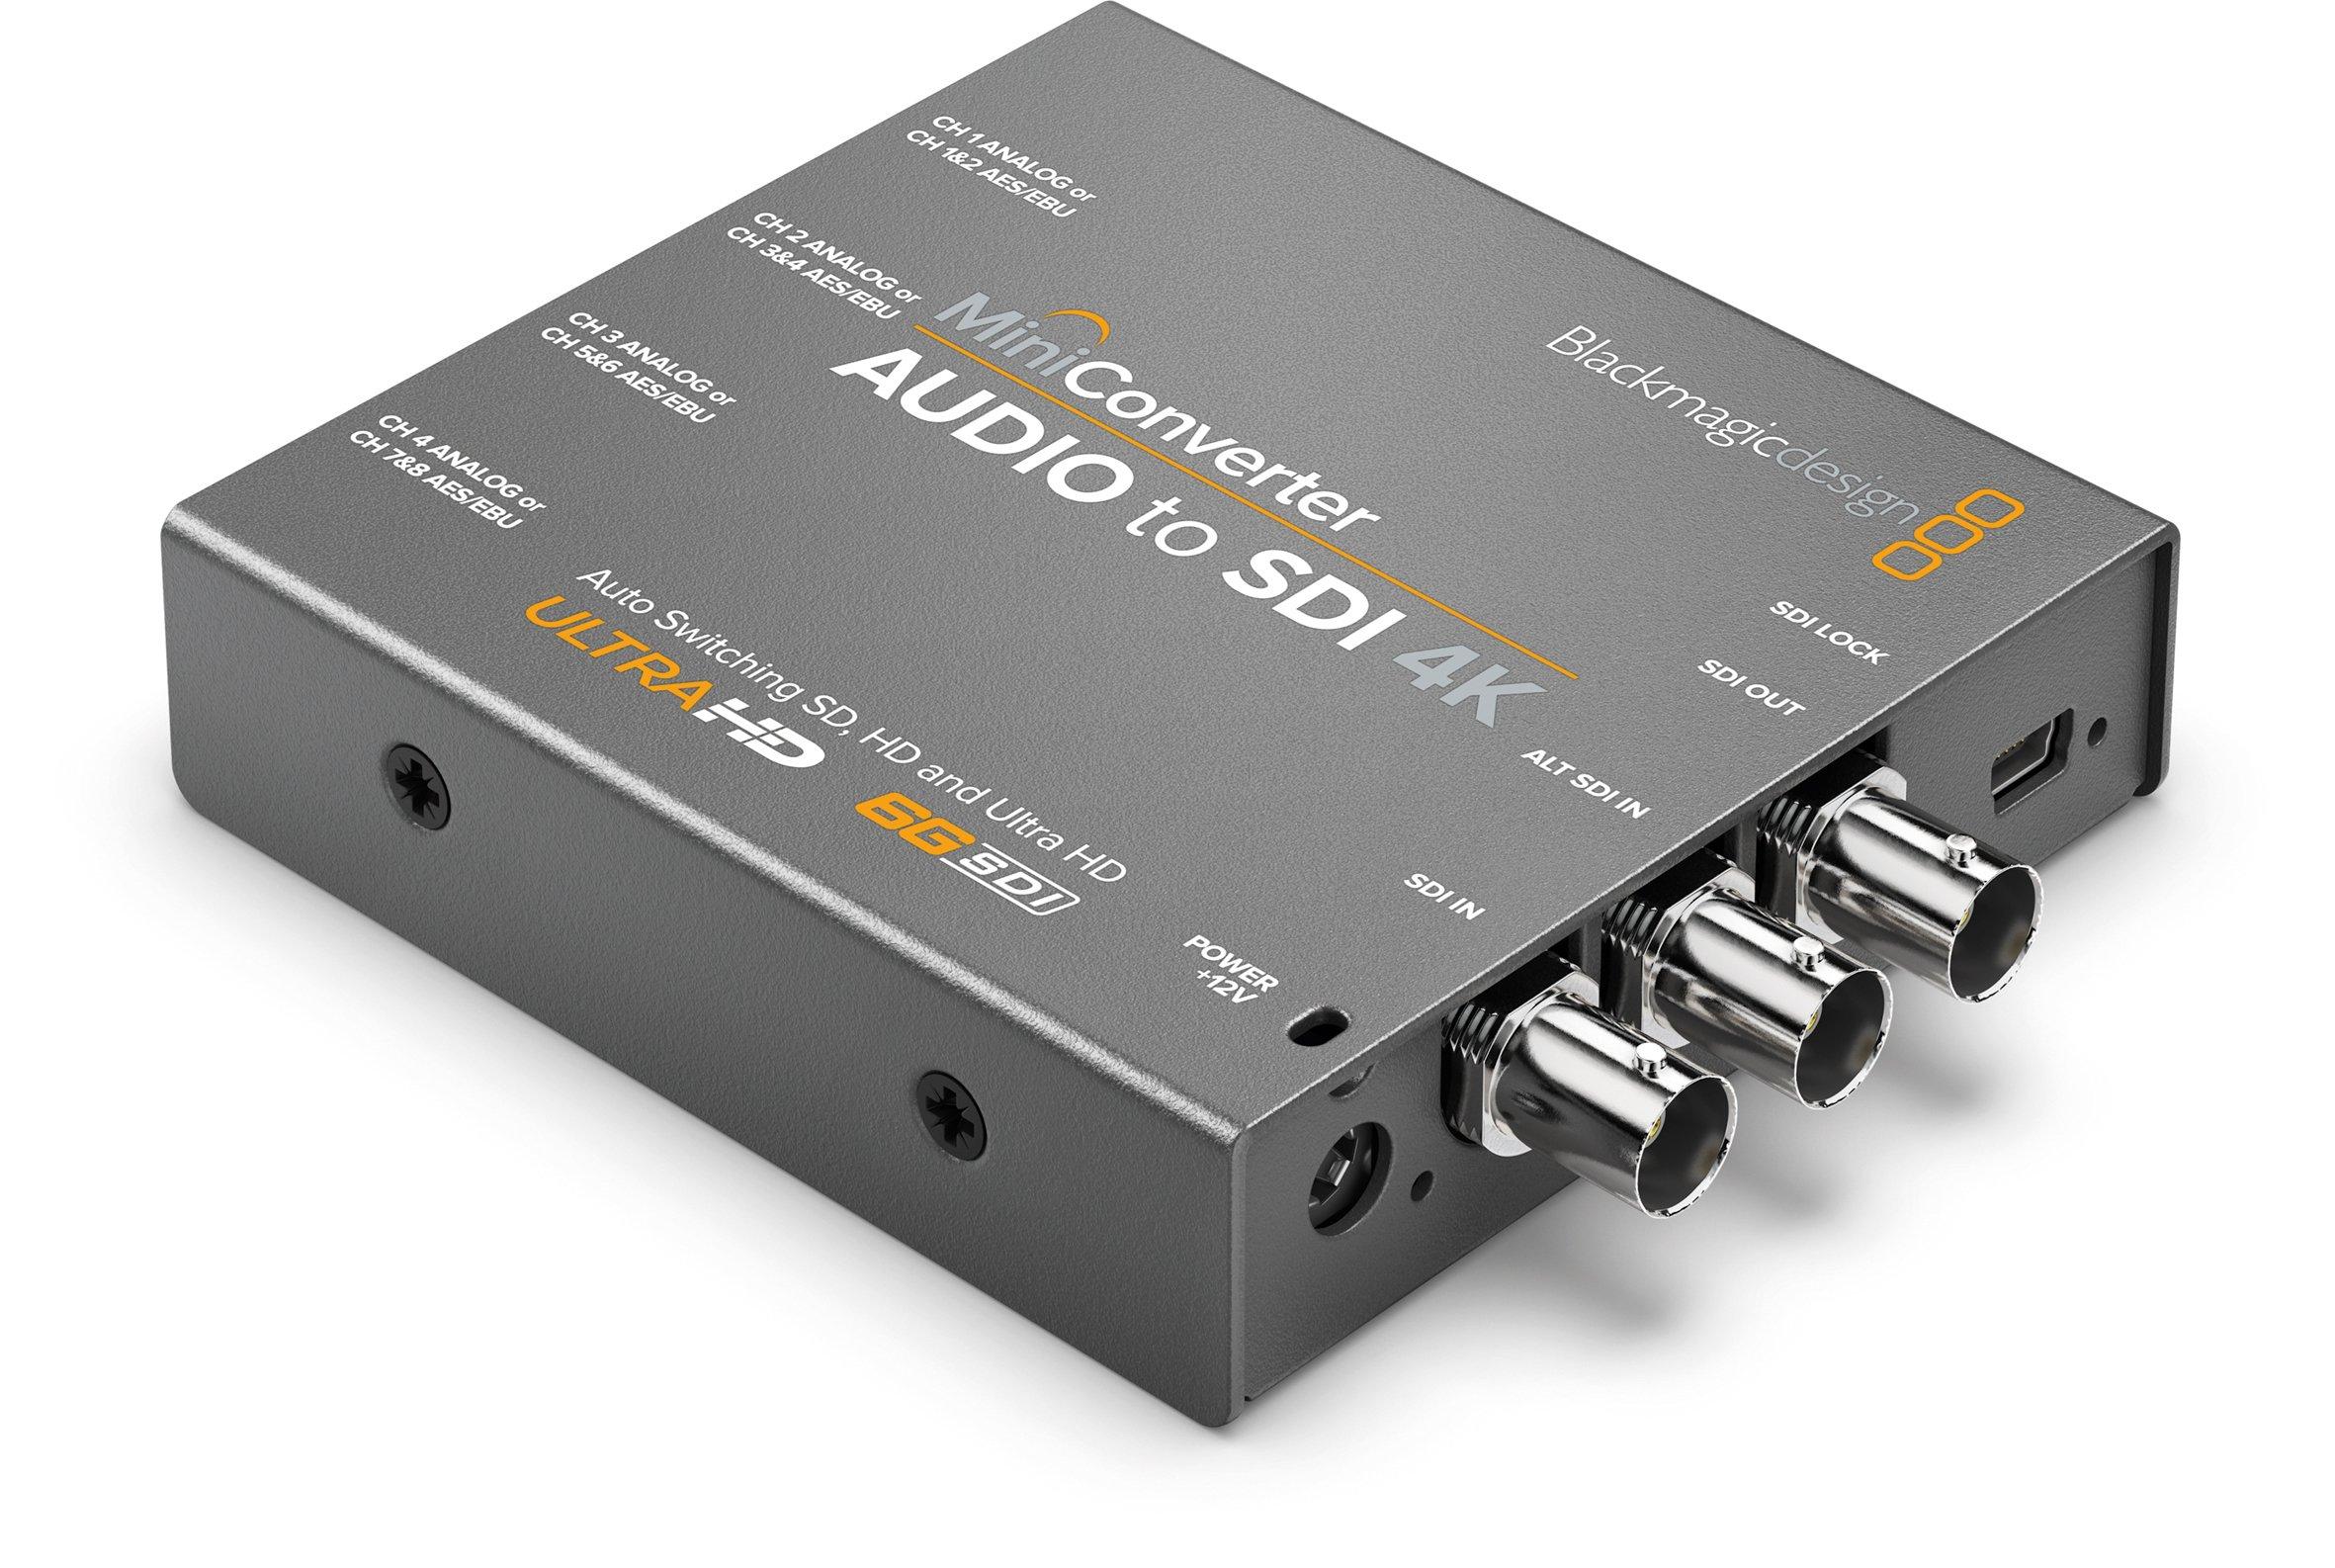 Blackmagic Design Mini Converter Audio to SDI 4K (BMD-CONVMCAUDS4K)